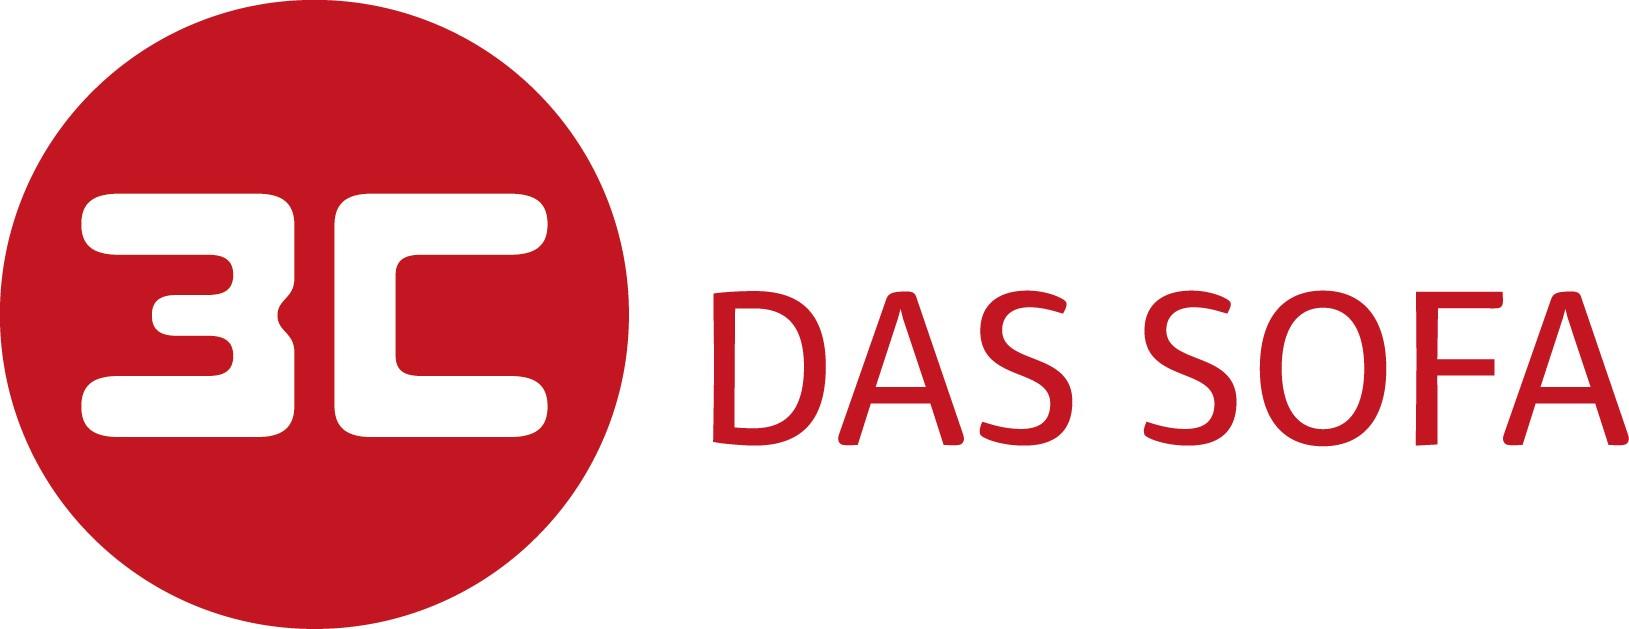 Sachbearbeitung Stammdaten (m/w/d) - Job Rheda-Wiedenbrück - Karriere bei 3C  - Application form